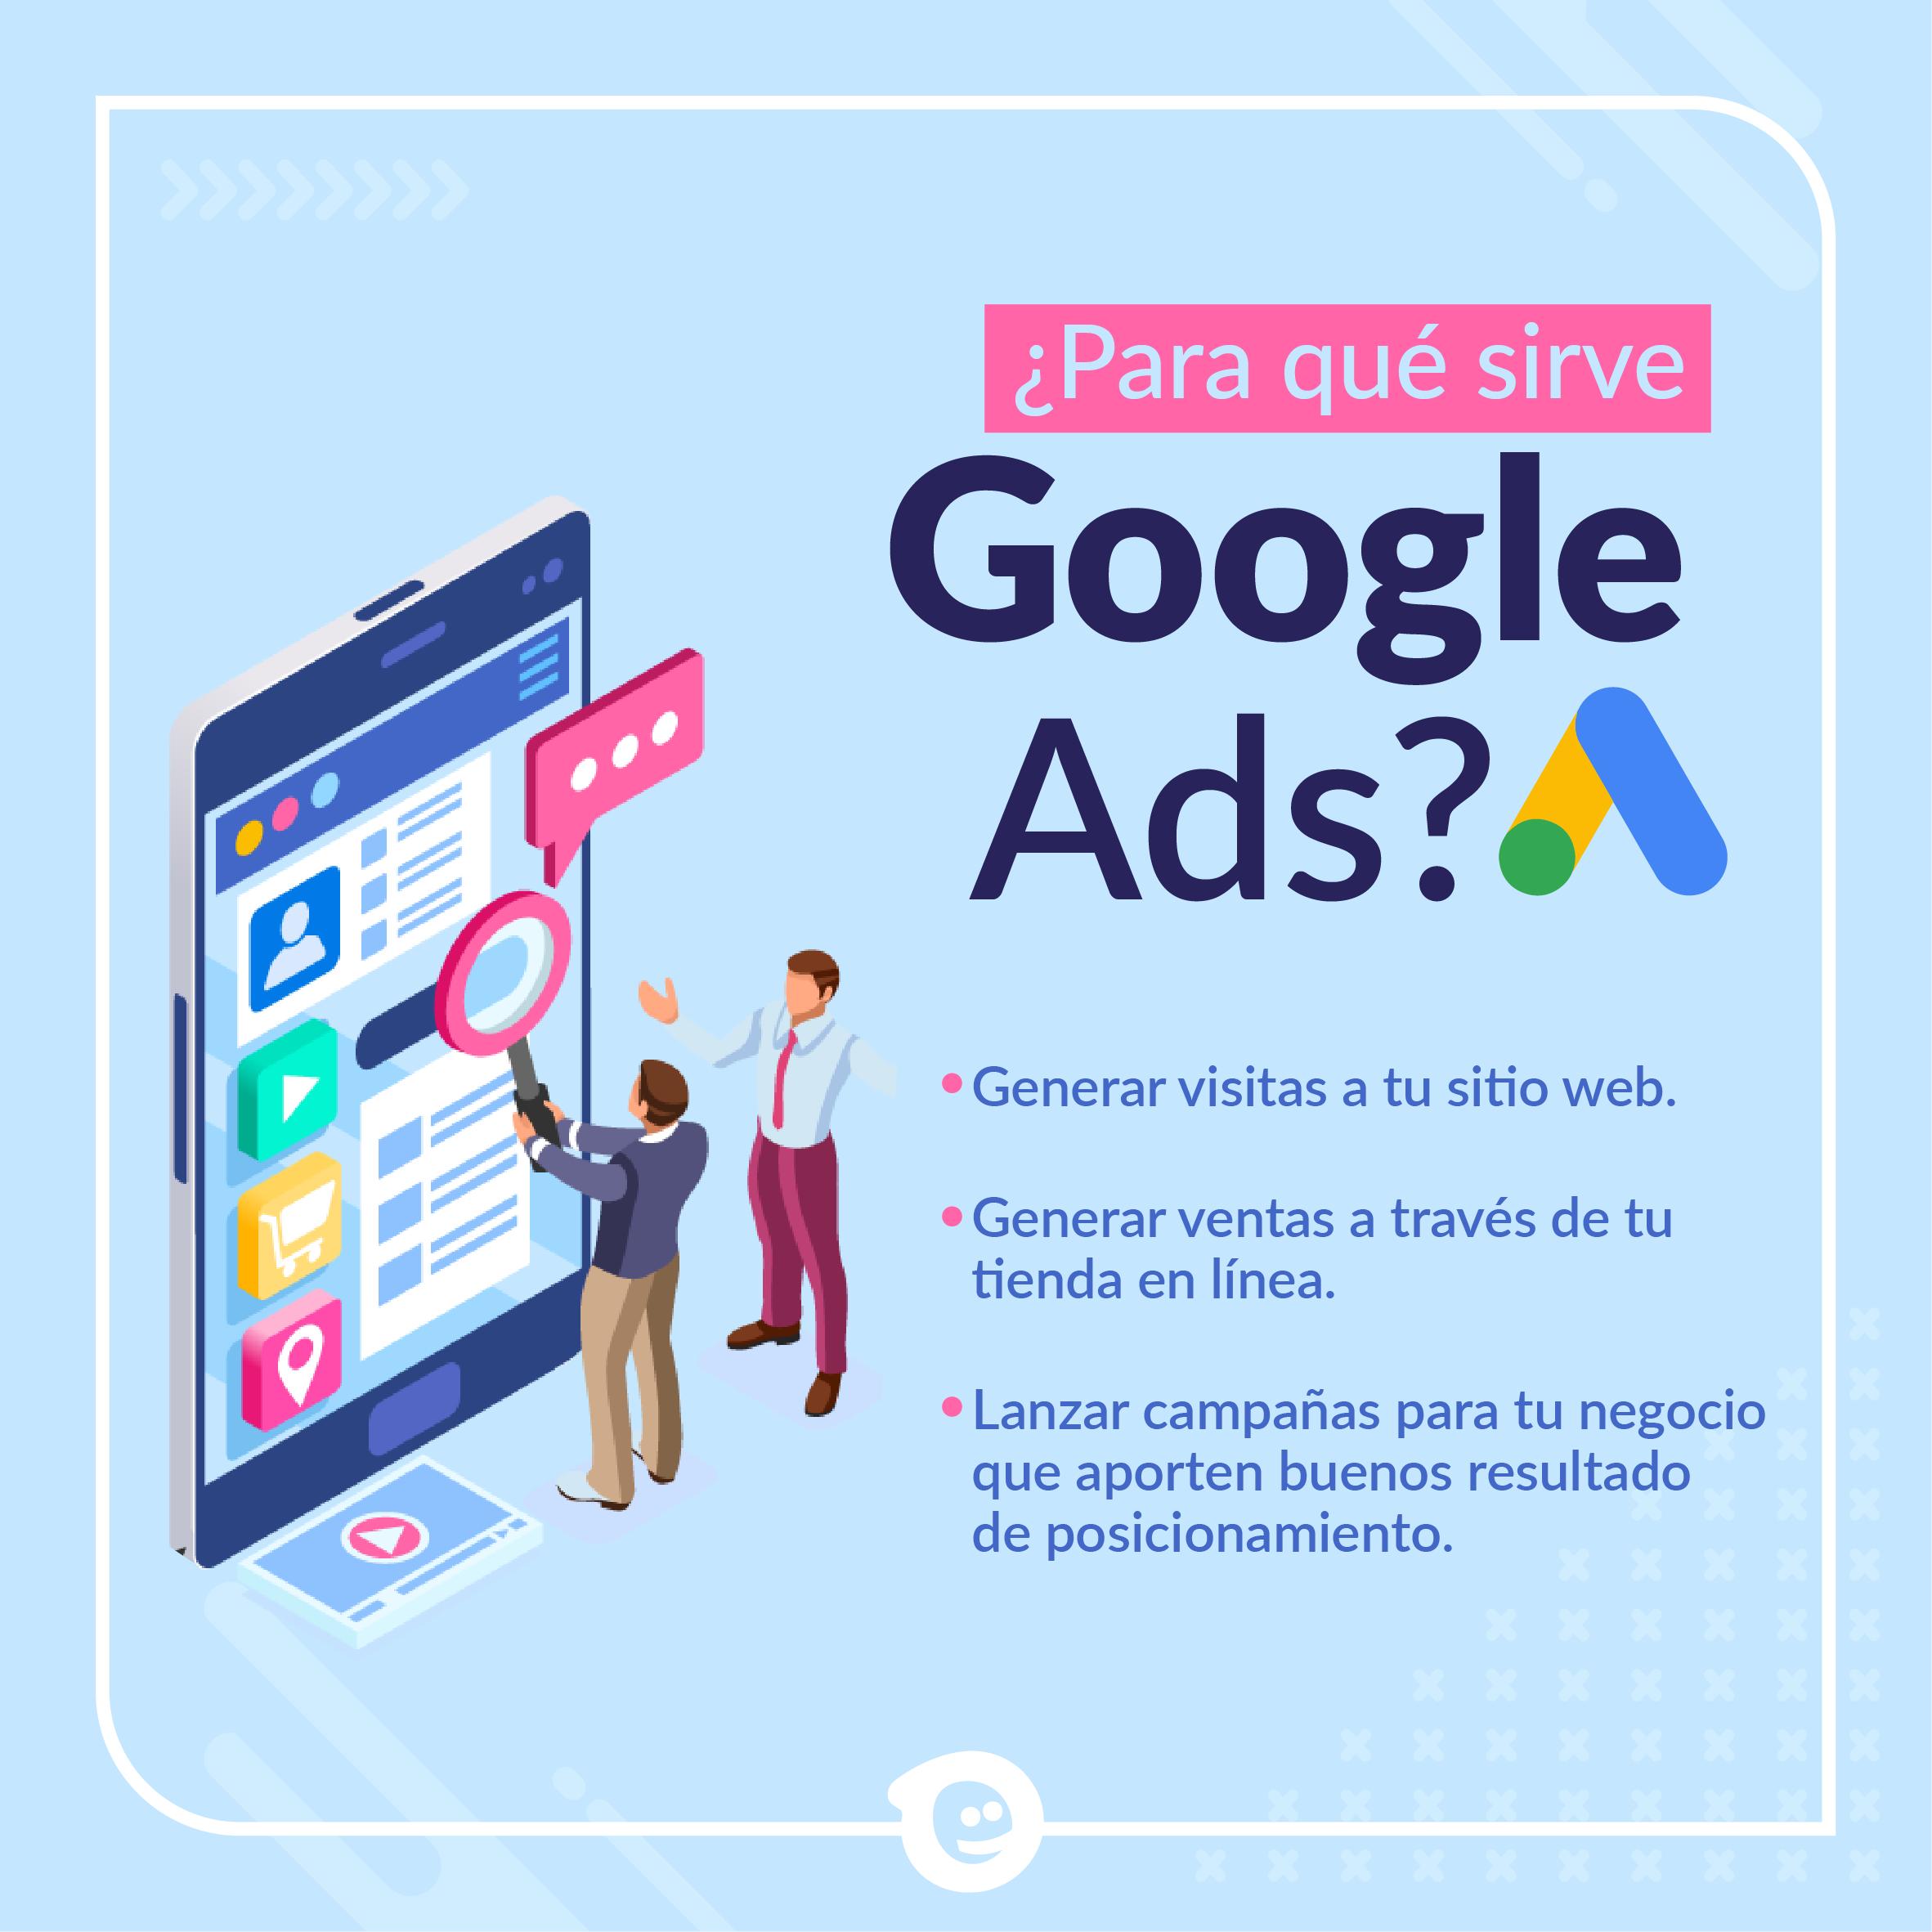 Para qué sirve Google Ads